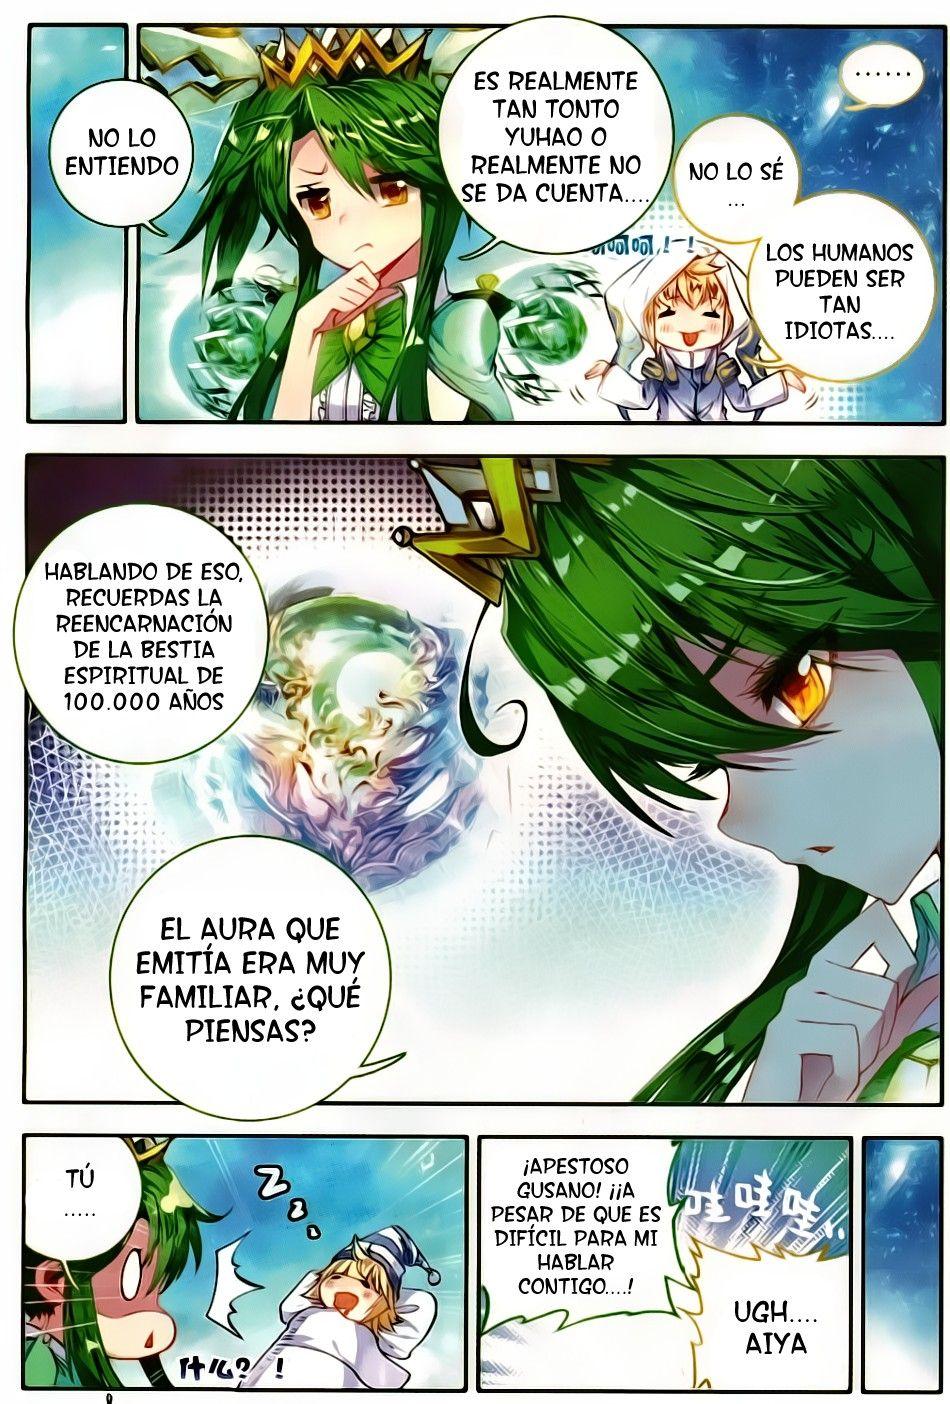 http://c5.ninemanga.com/es_manga/pic2/33/16417/511290/41a3d2506bf56db30a0c24710a23e937.jpg Page 4